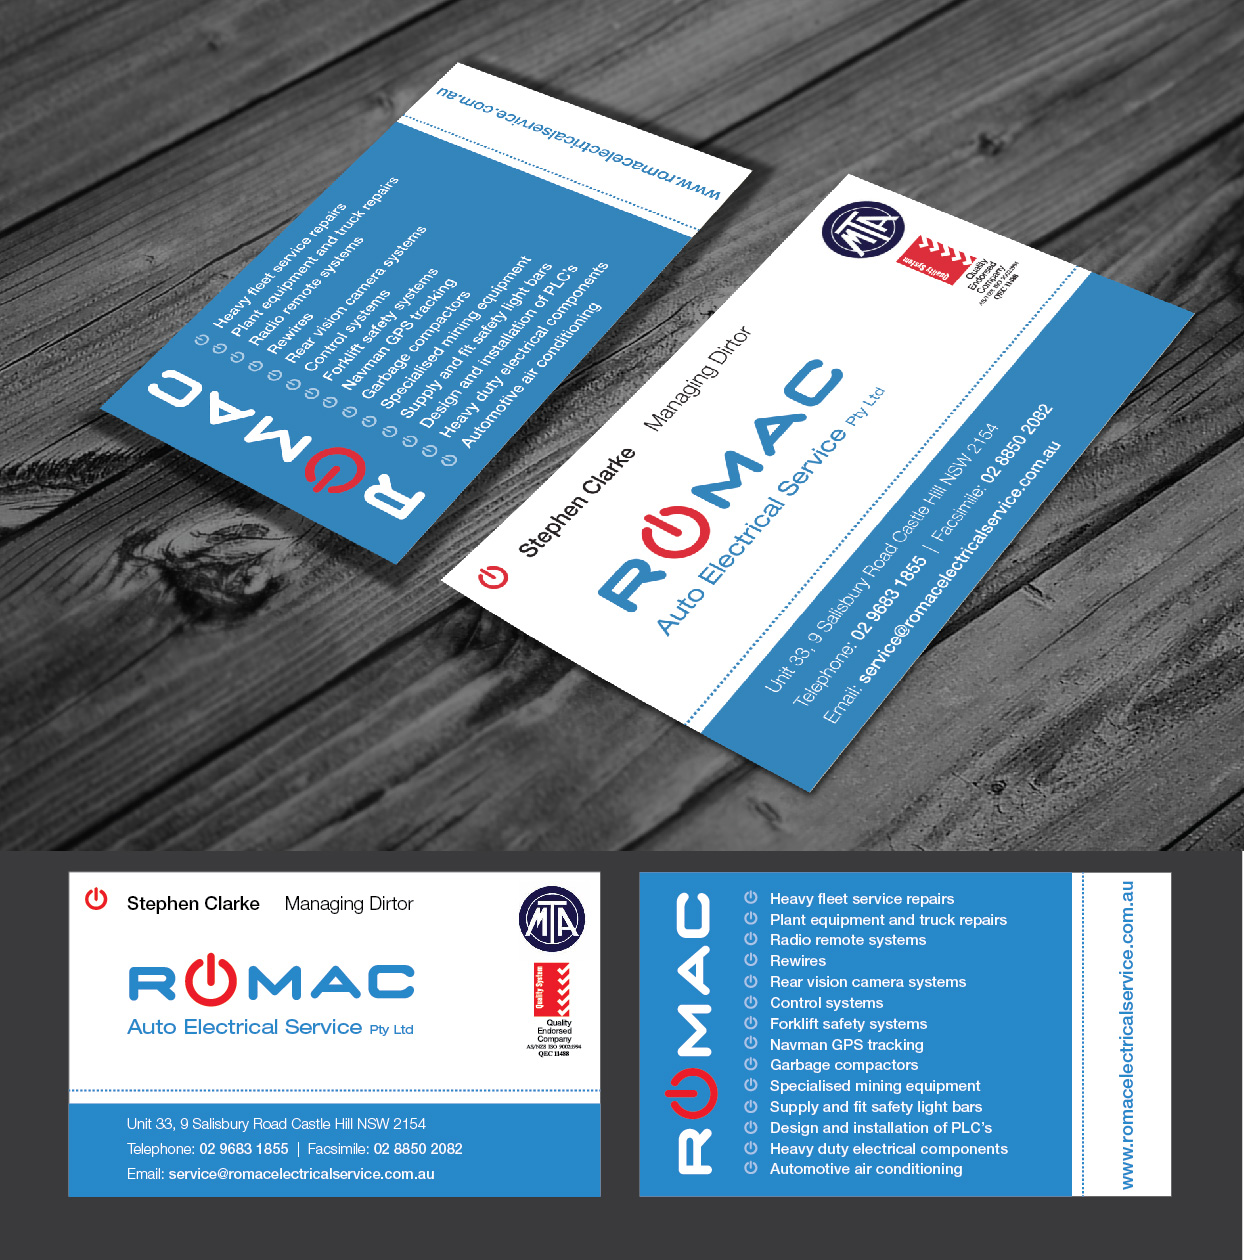 Business Business Card Design for printsales.com.au by G.Krastinkova ...